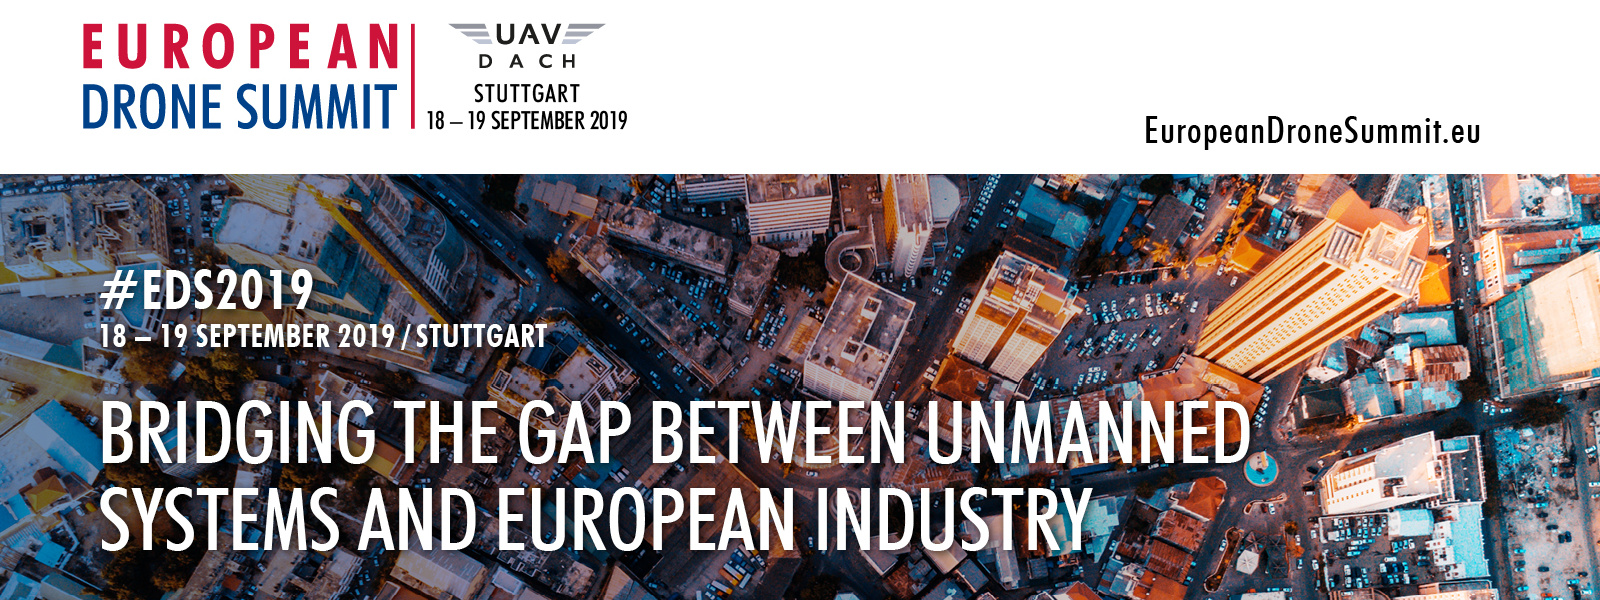 European Drone Summit 2019